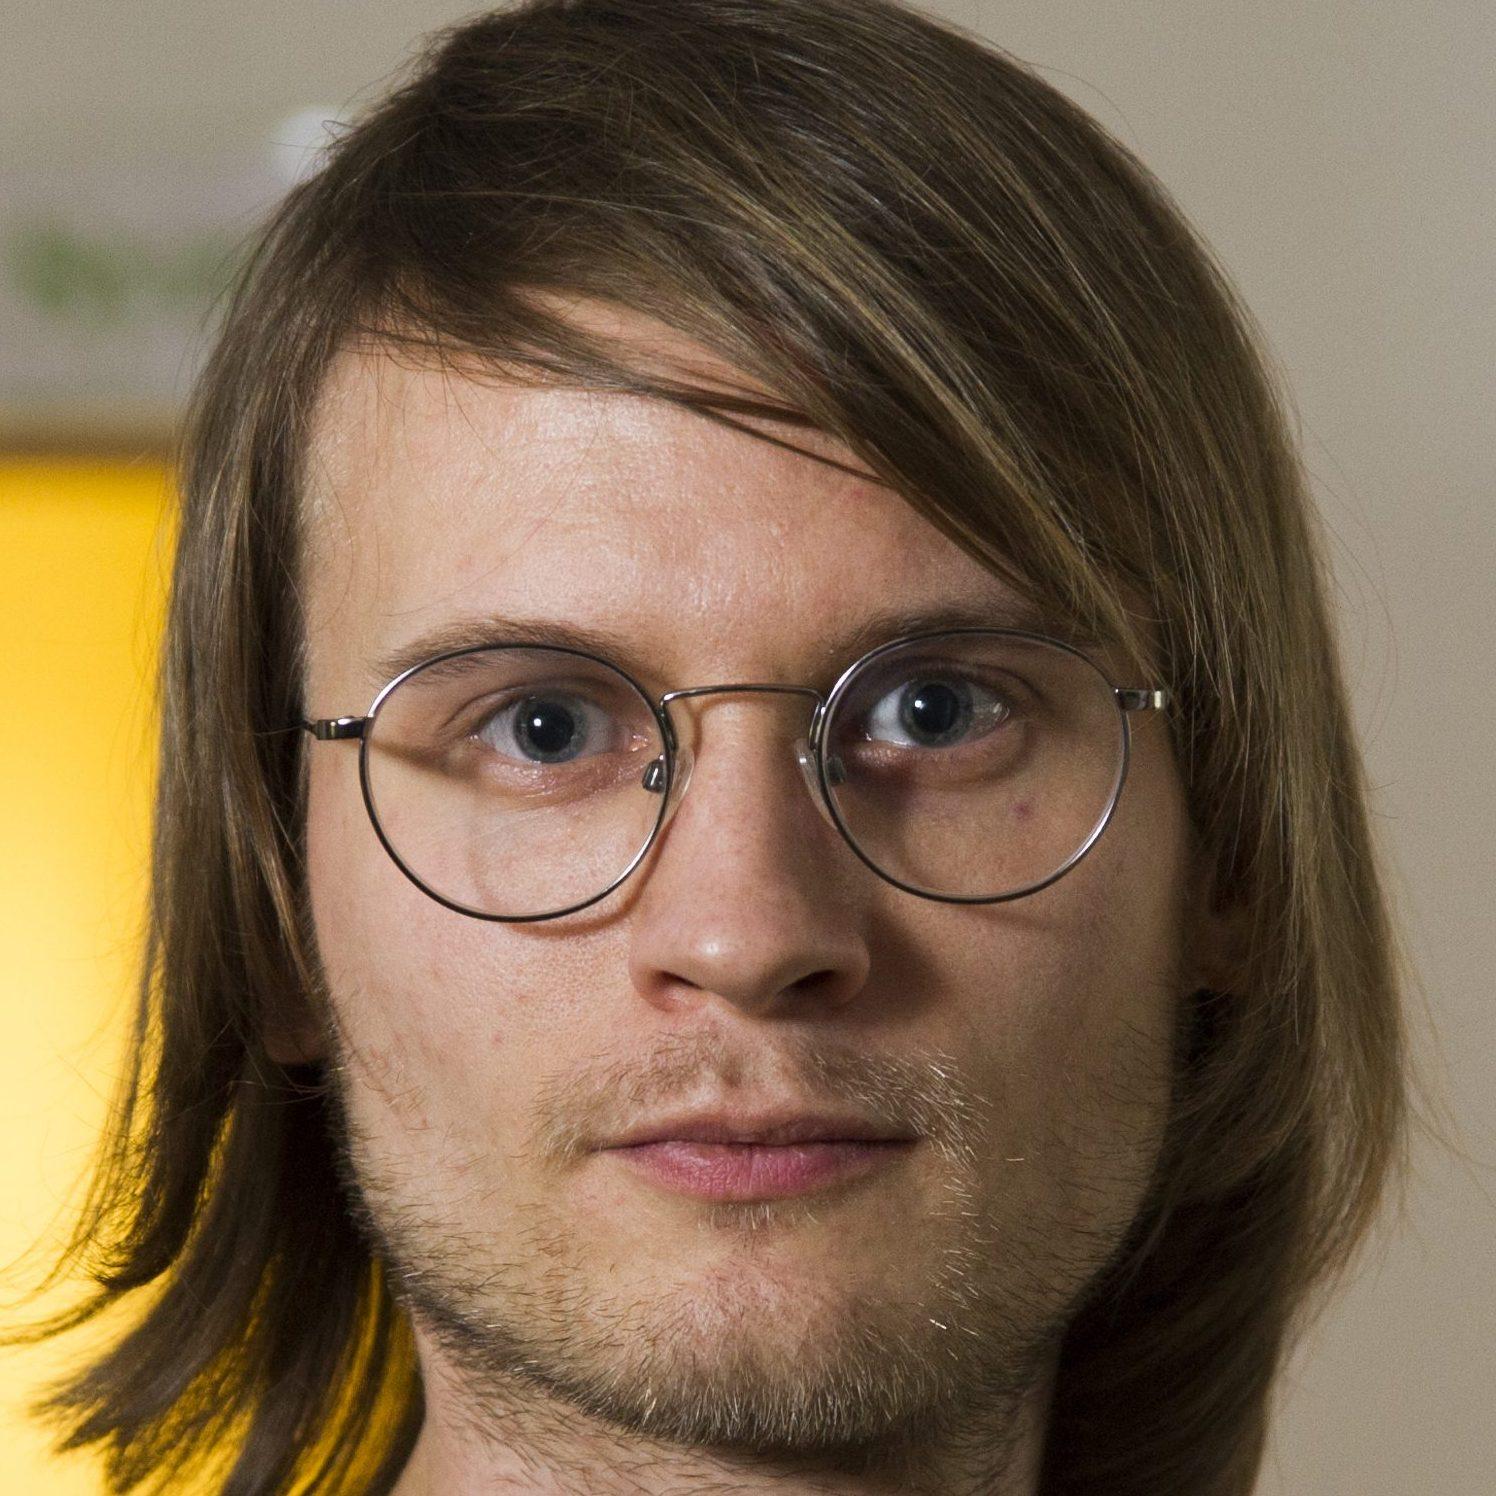 https://tidningensyre.se/wp-content/uploads/2019/03/Valdemar-Möller-e1552604535971.jpg